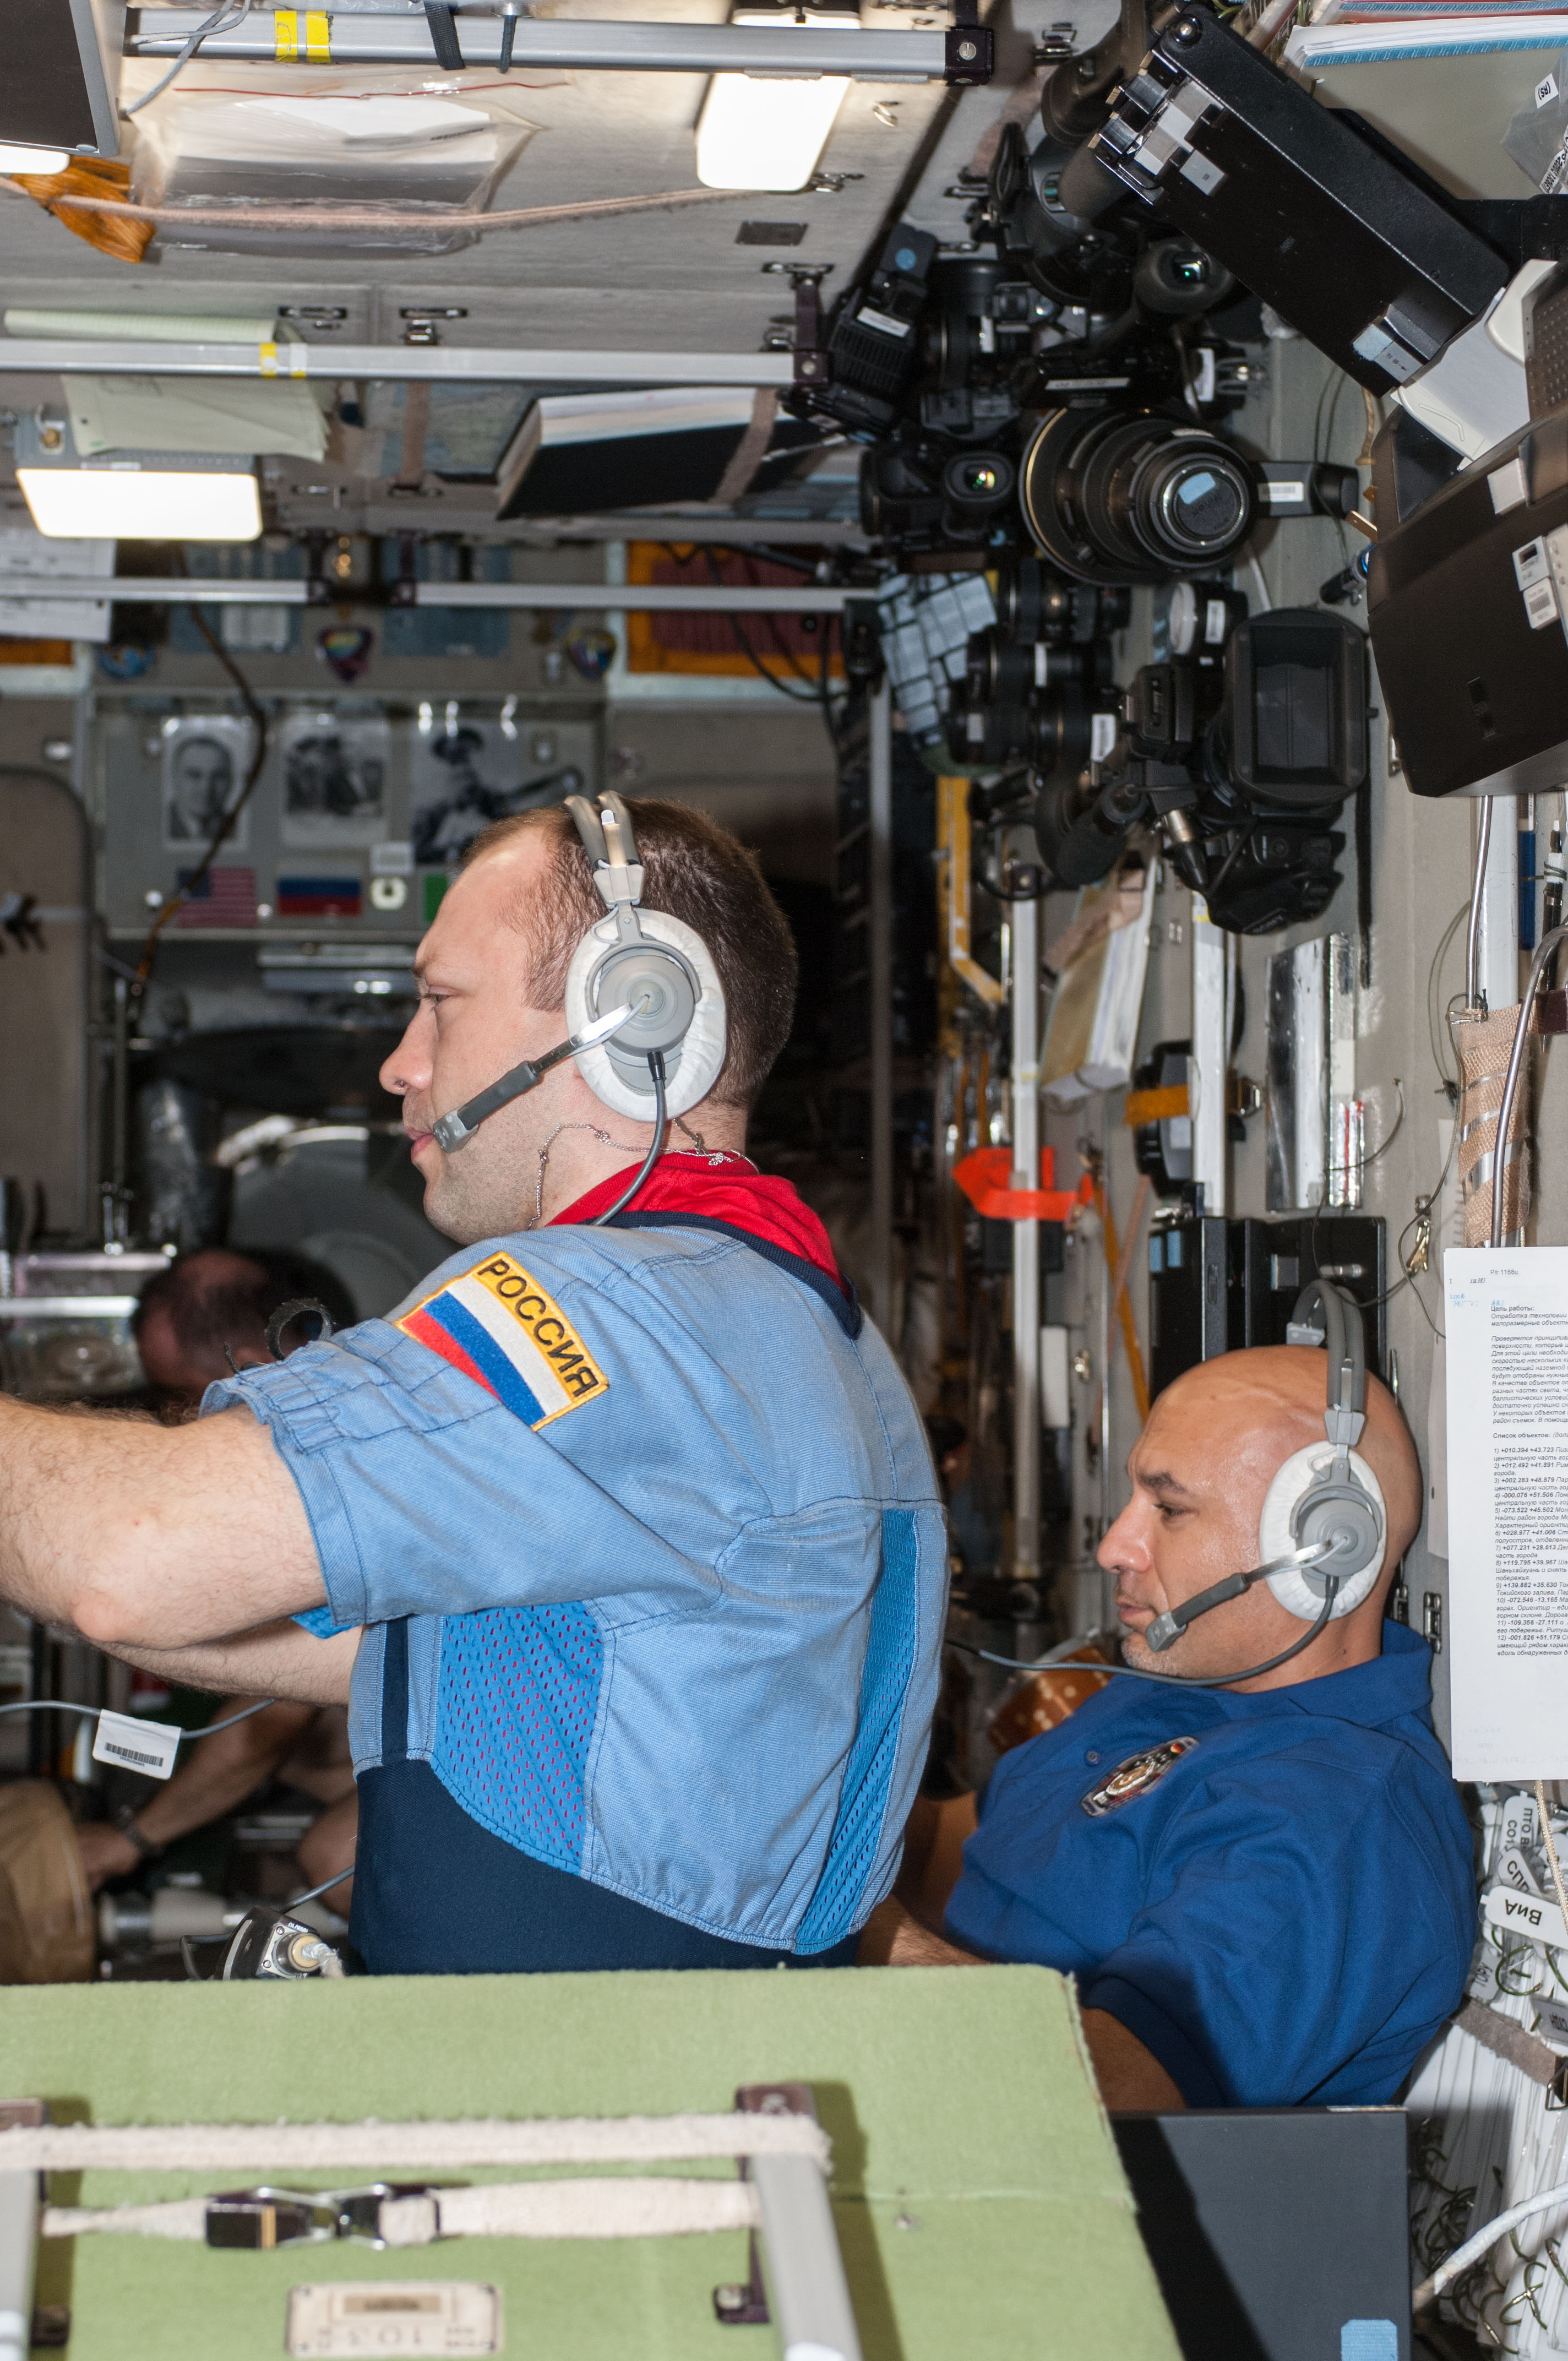 ISS Crew Awaits ATV-4